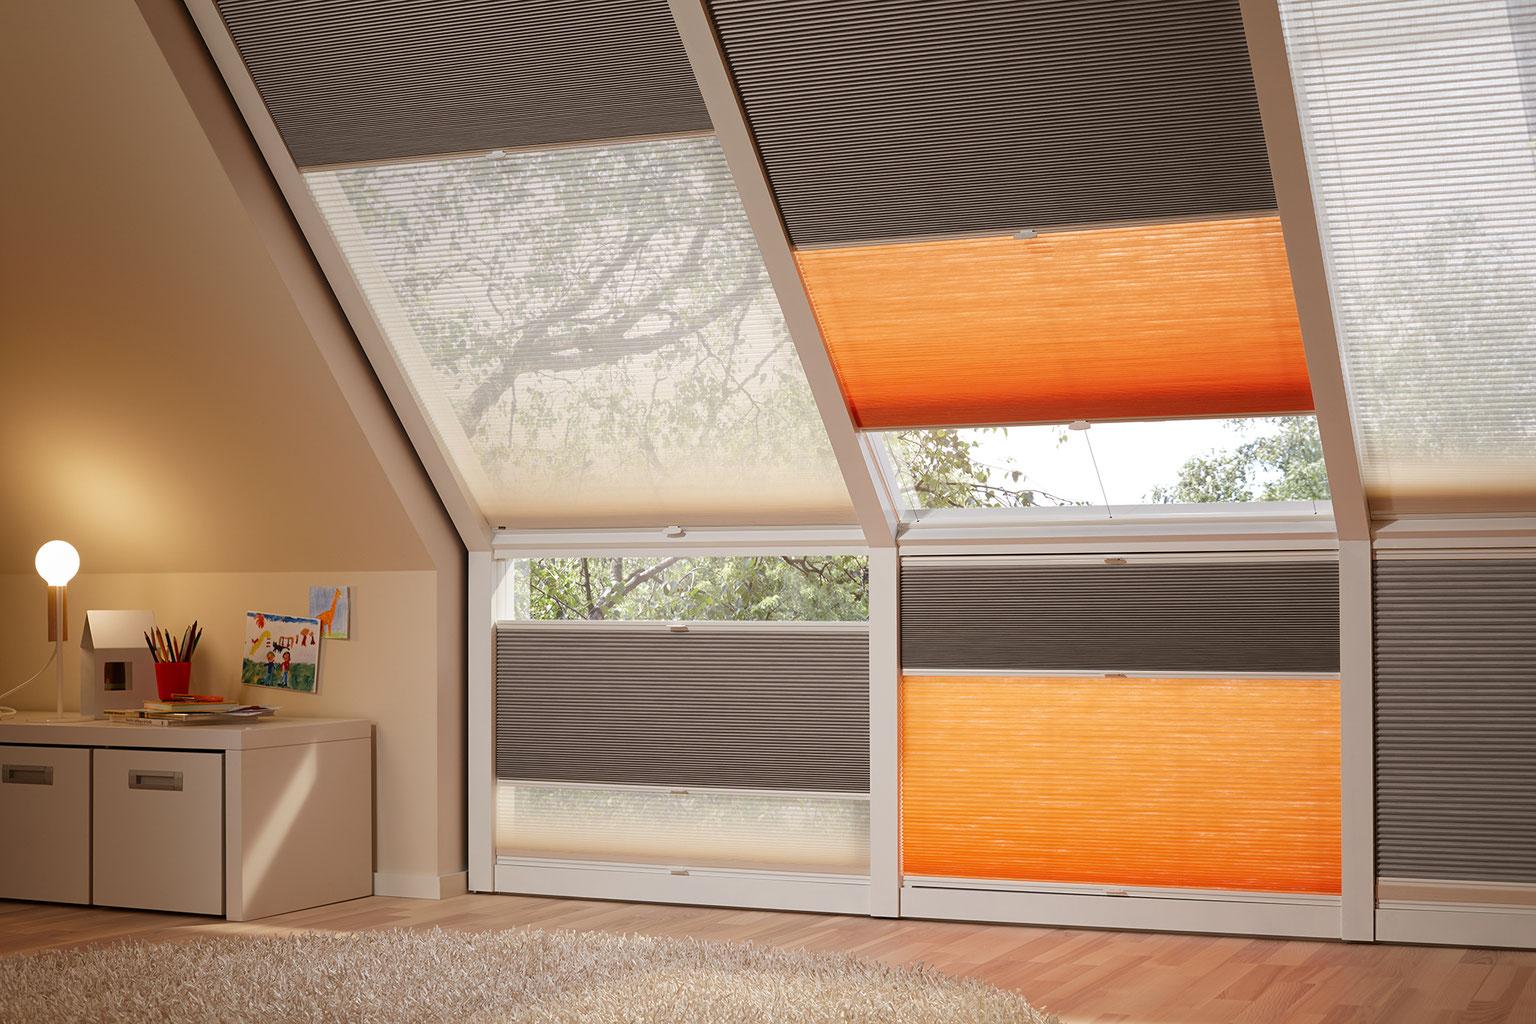 Full Size of Verdunkelung Kinderzimmer Plissees Dachfenster Lamellen Junker Regal Fenster Regale Weiß Sofa Kinderzimmer Verdunkelung Kinderzimmer